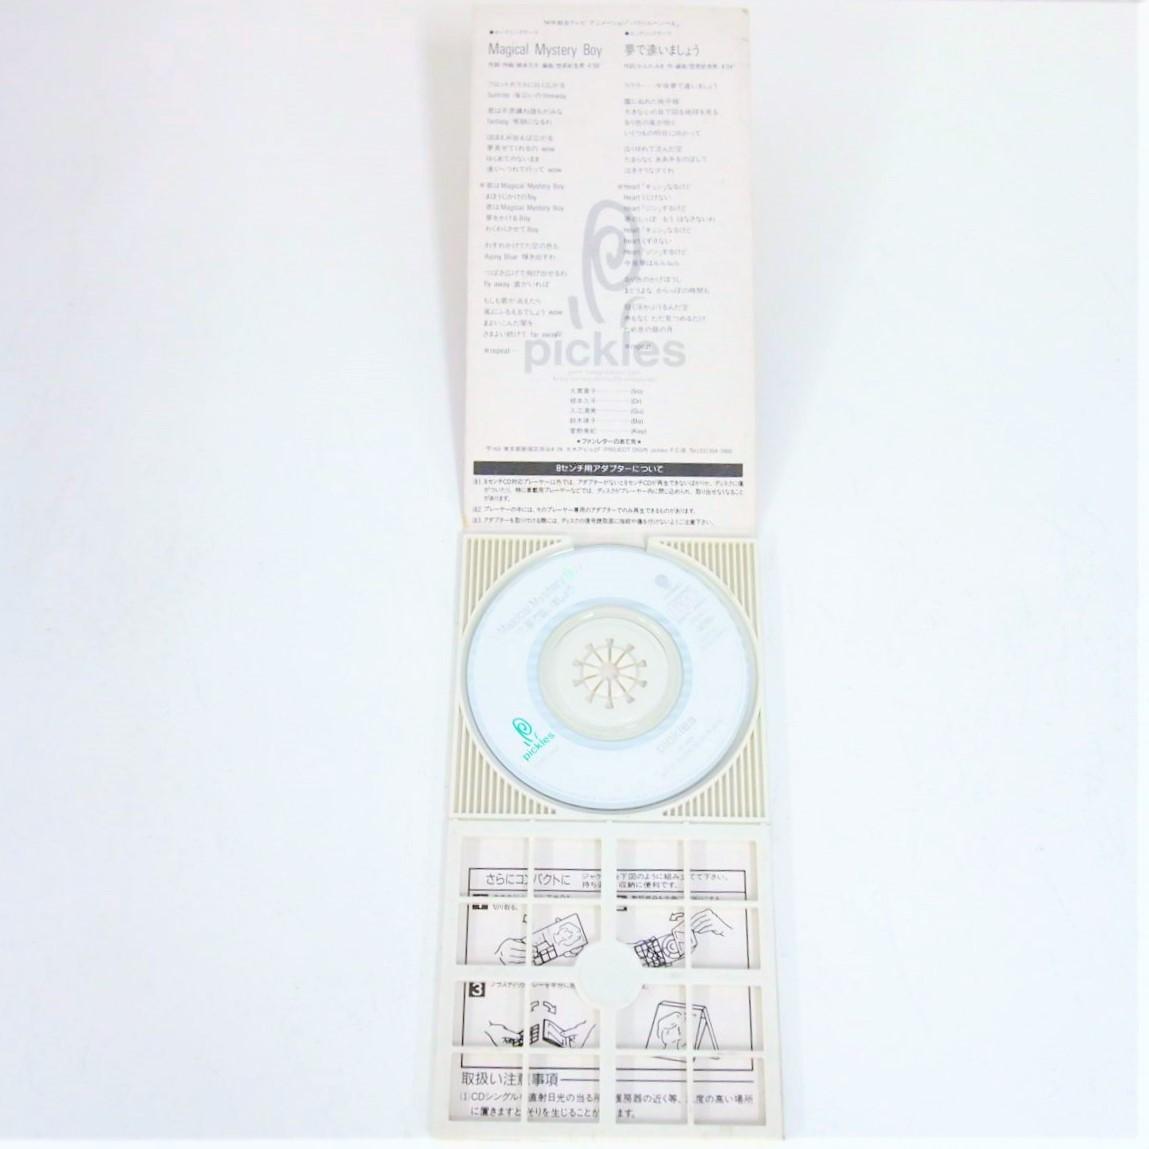 8cmCD盤面の画像